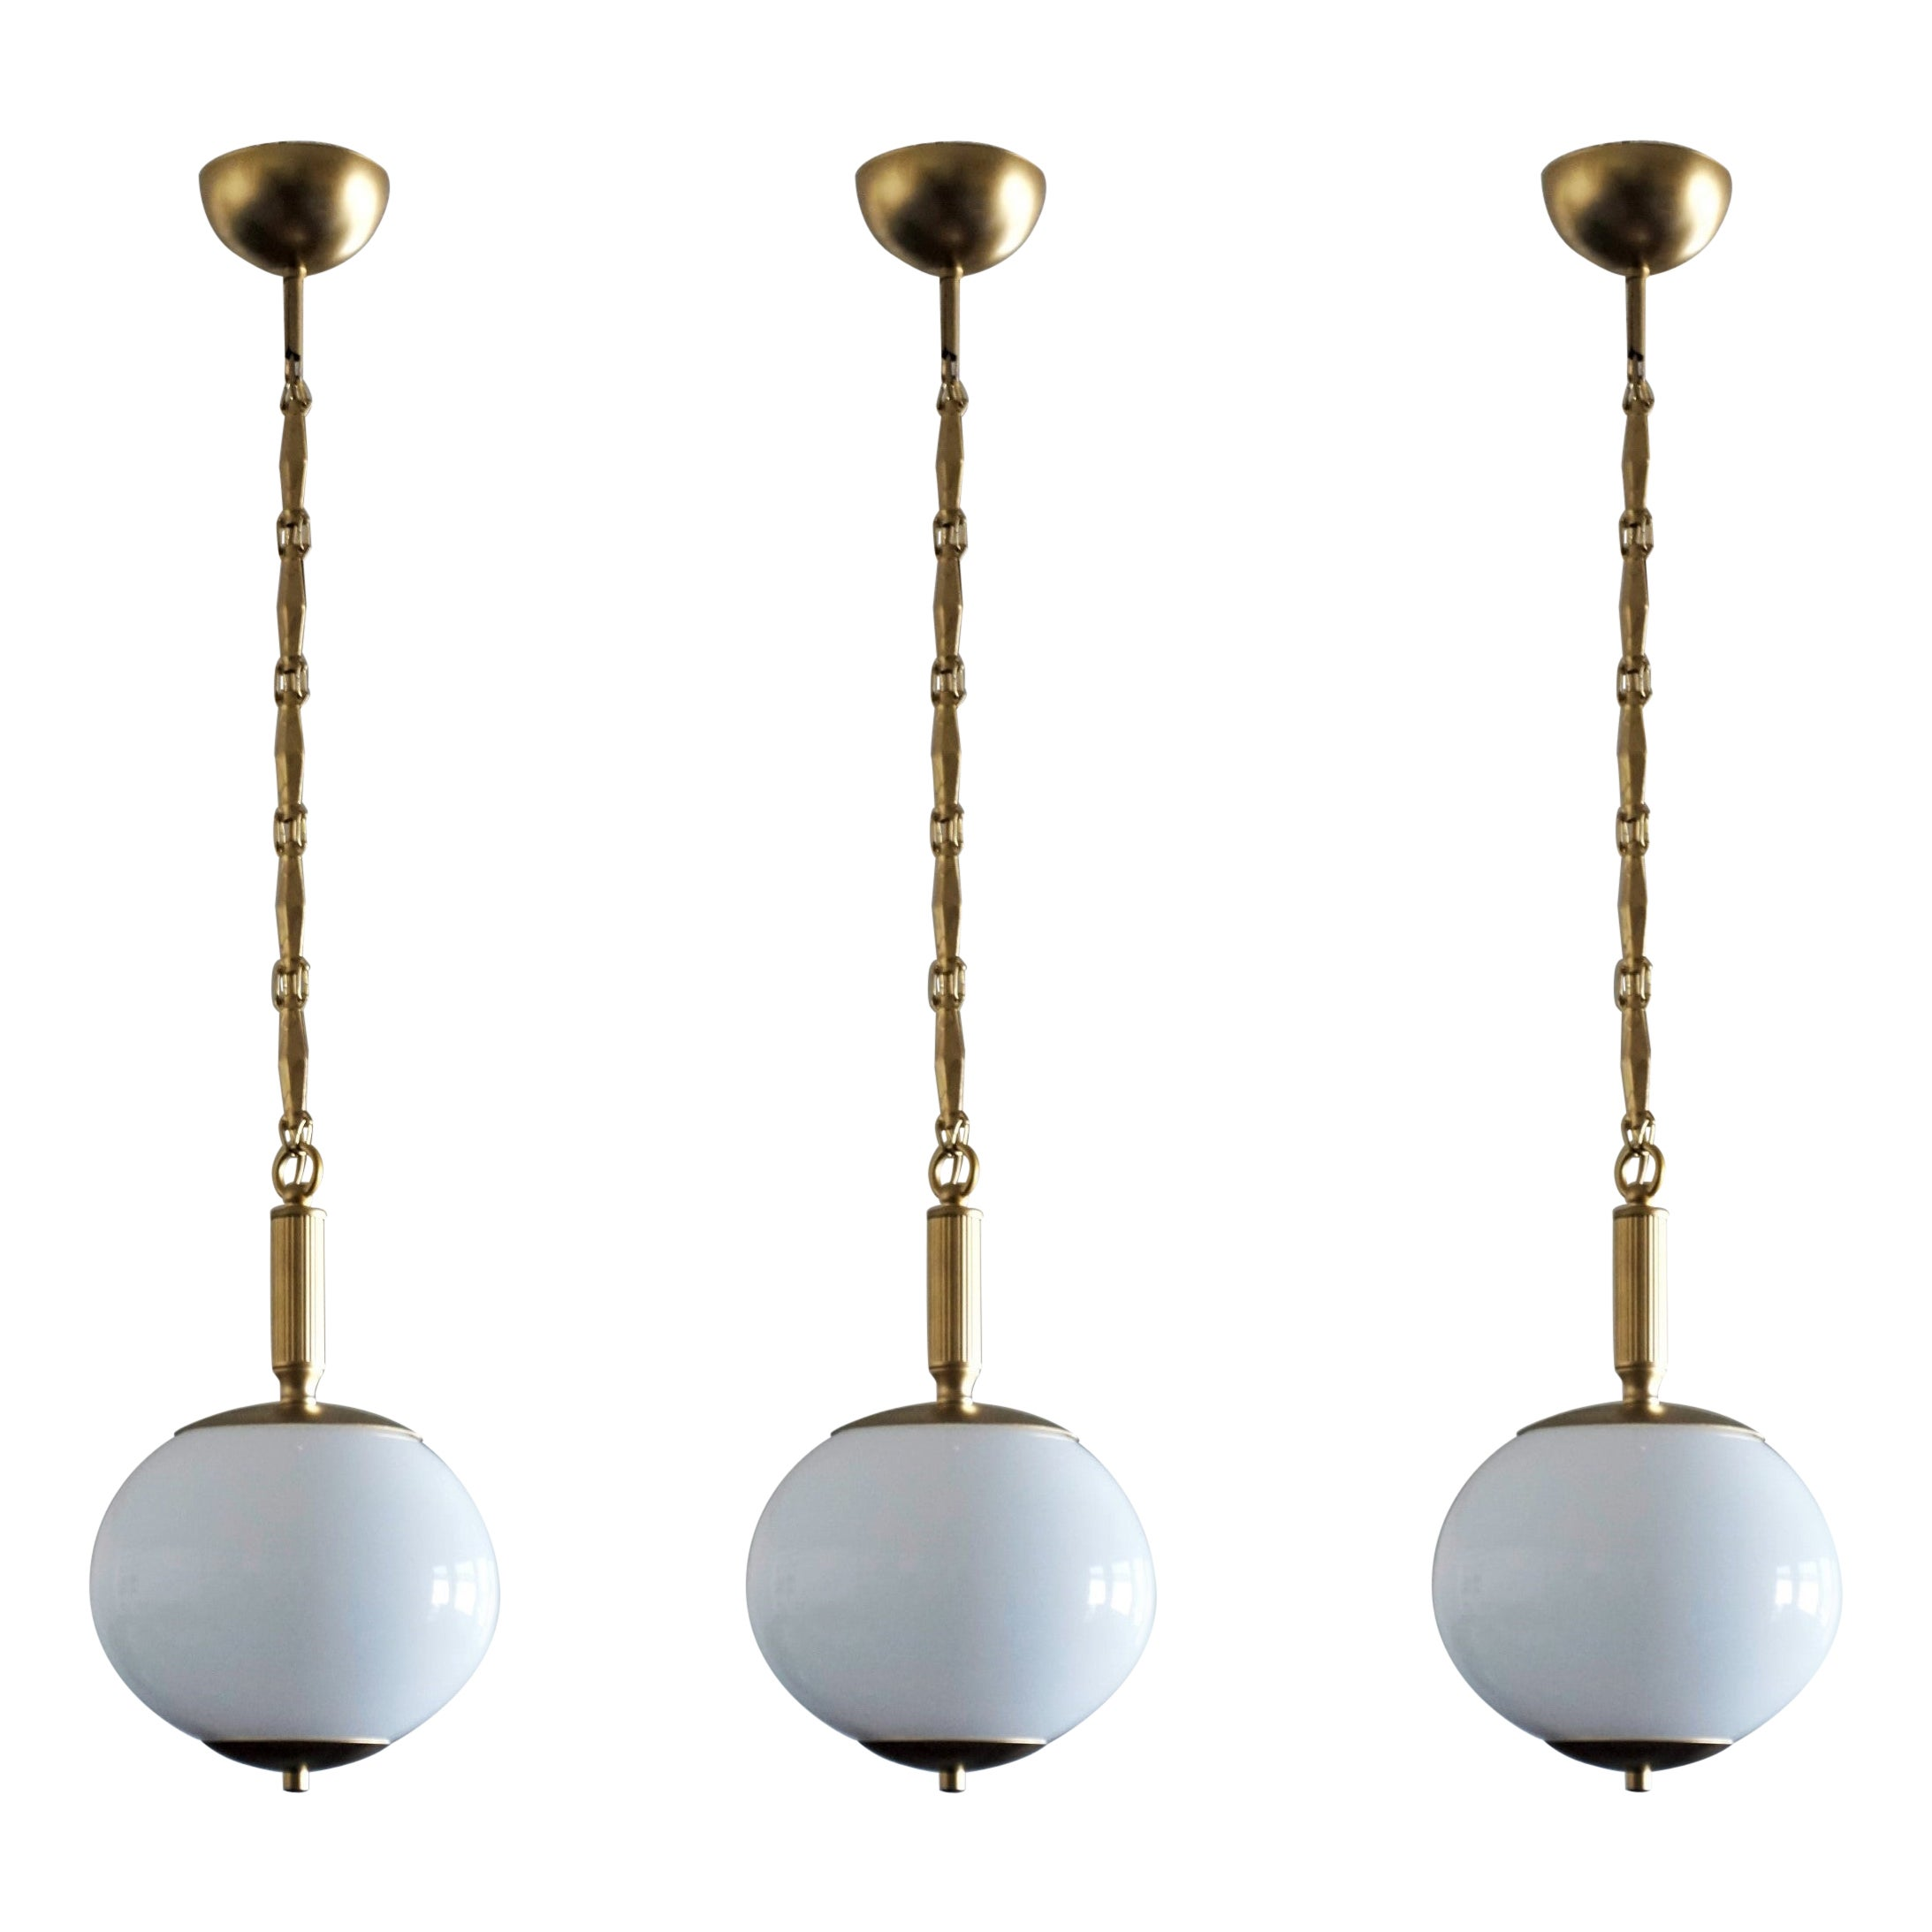 Set of Three Italian Art Deco Opaline Glass and Brass Pendants, 1950's